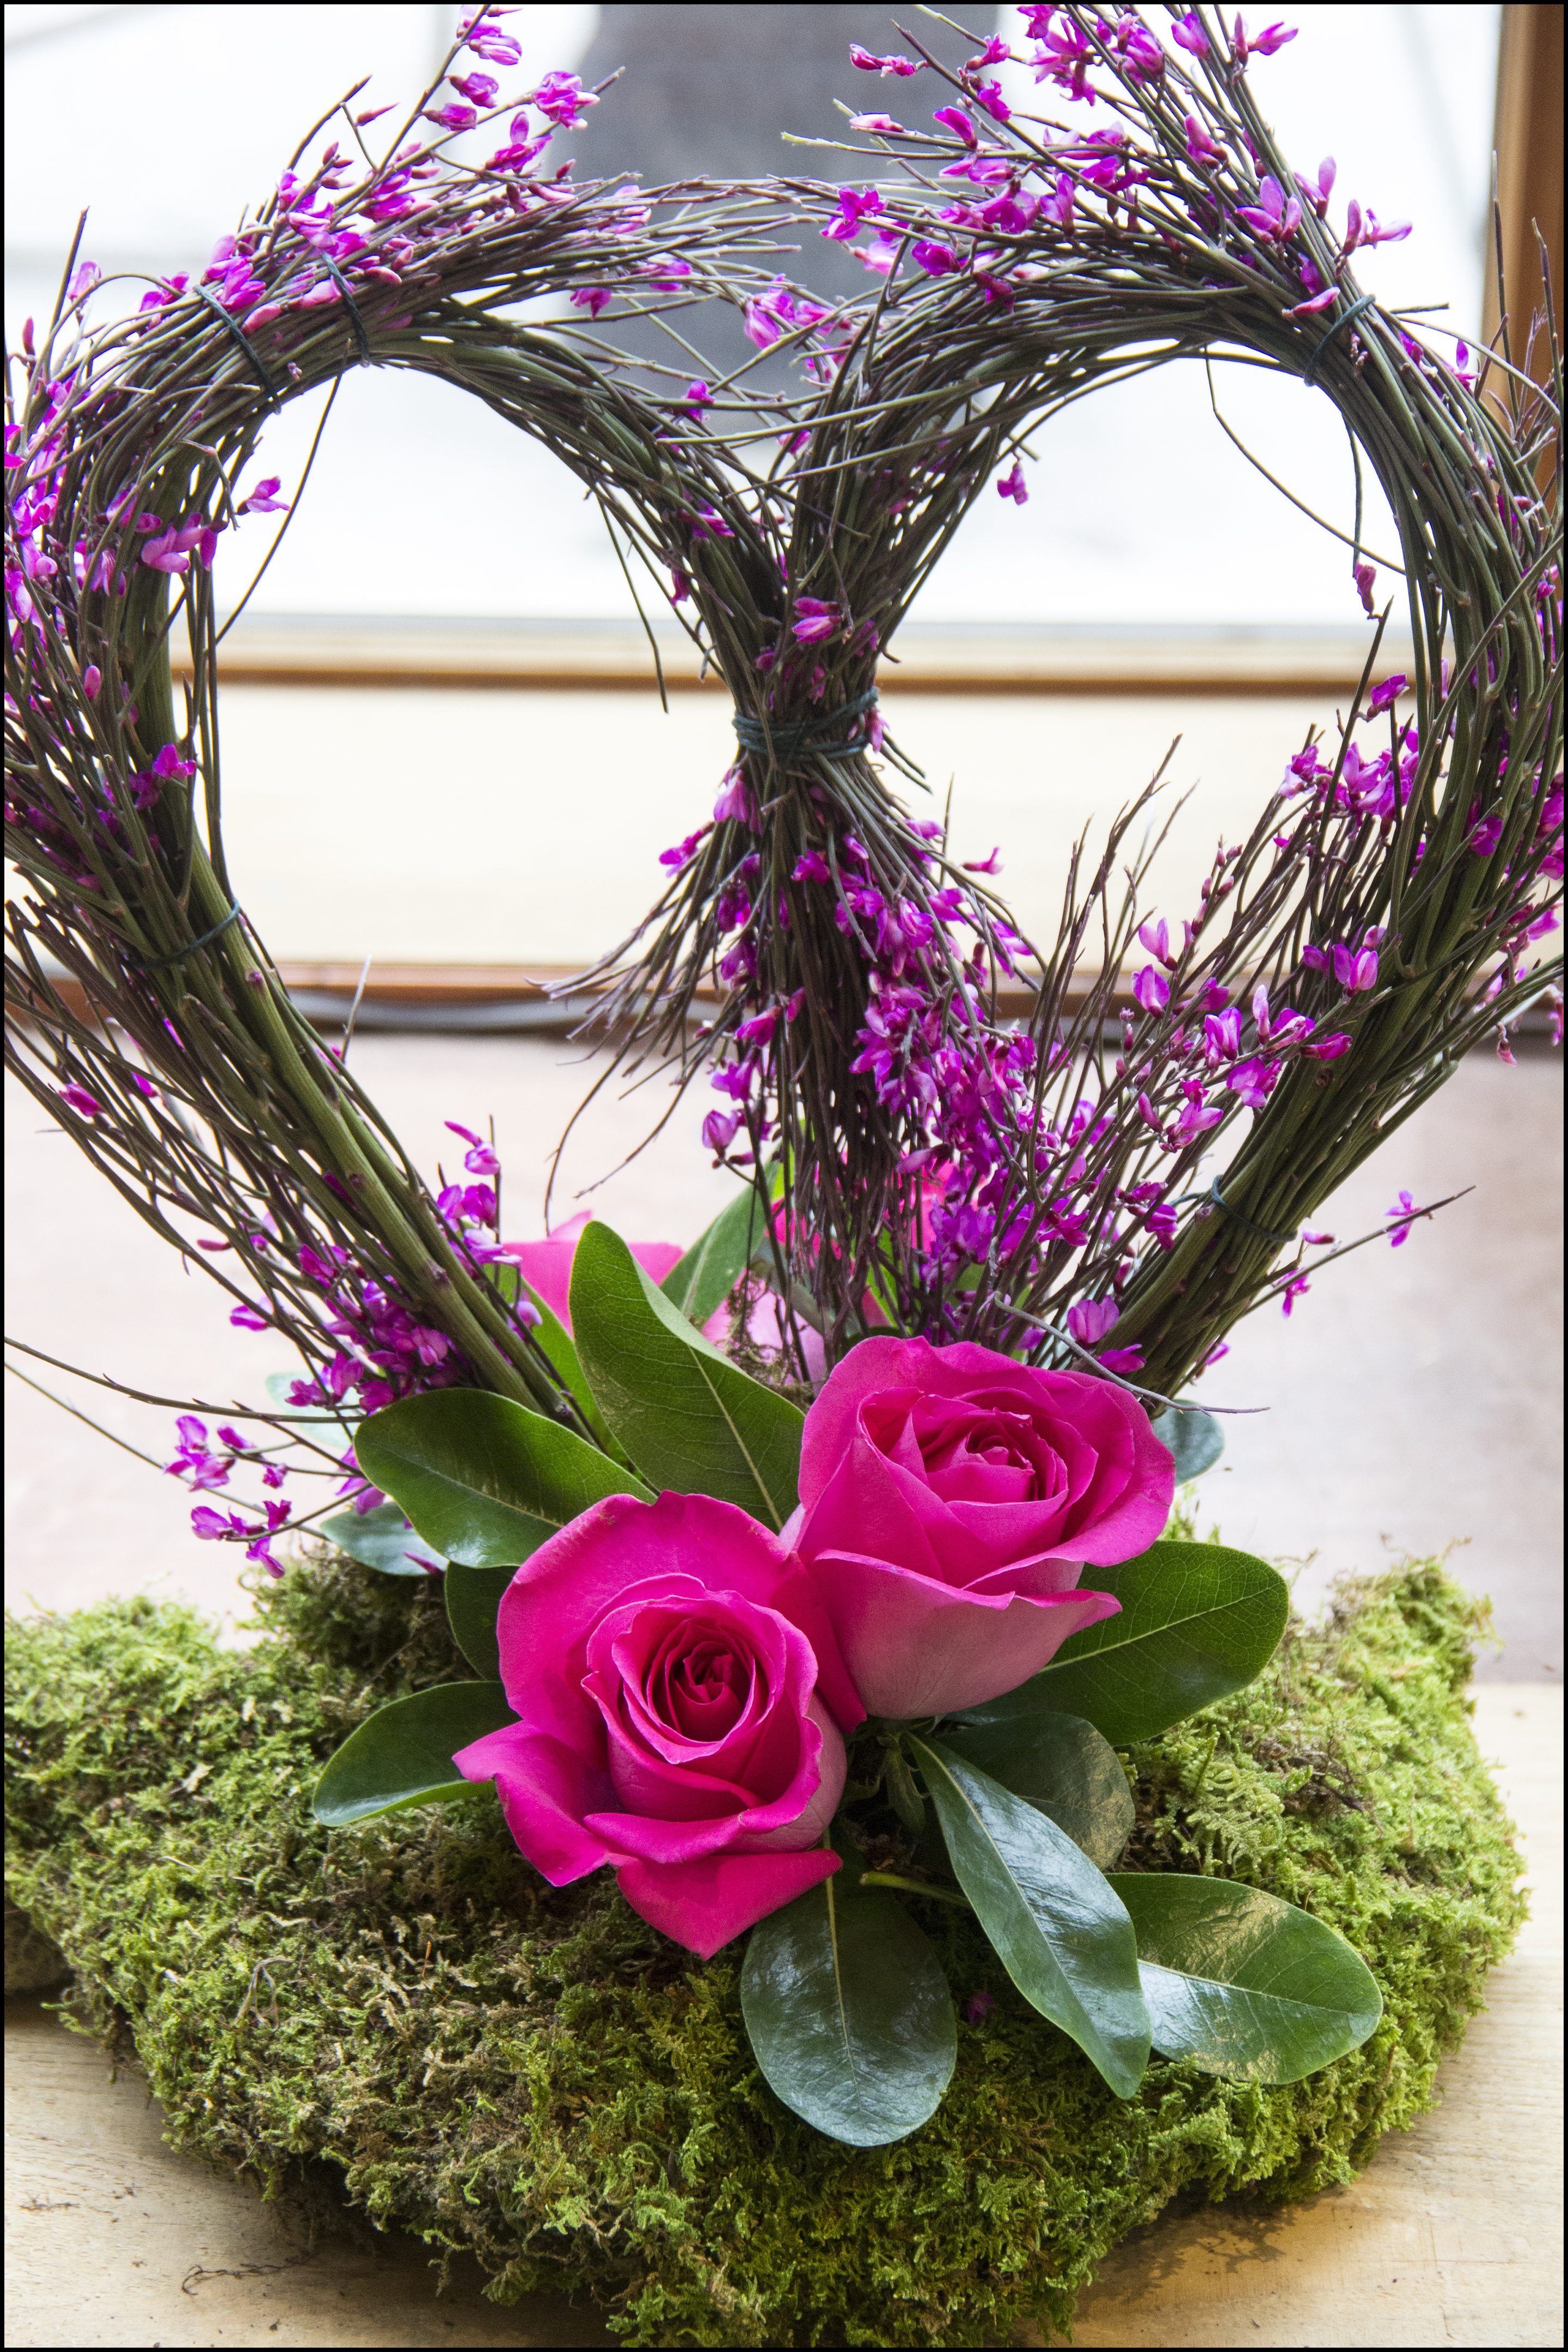 Valley forge flowers exceeding expectations - Fleur en forme de coeur ...